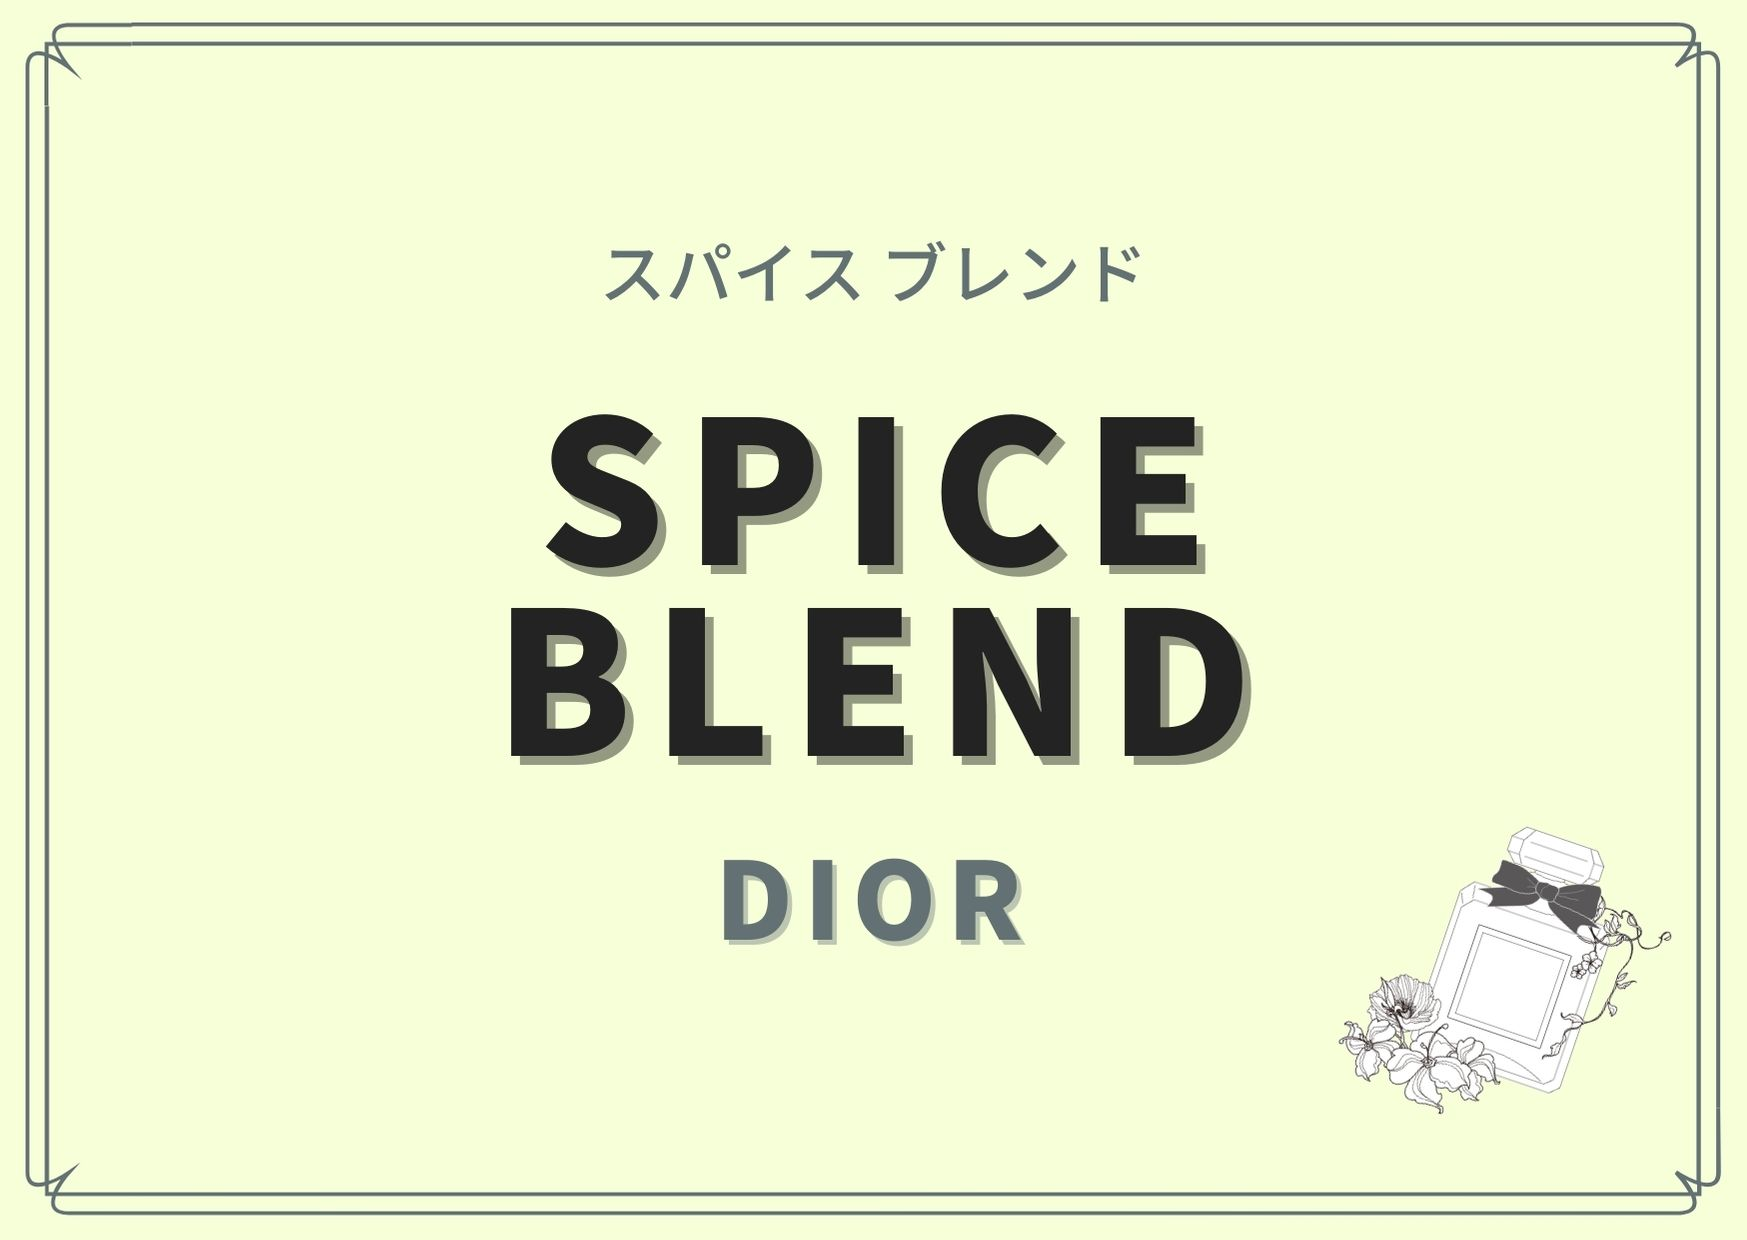 SPICE BLEND(スパイス ブレンド)/DIOR(ディオール)